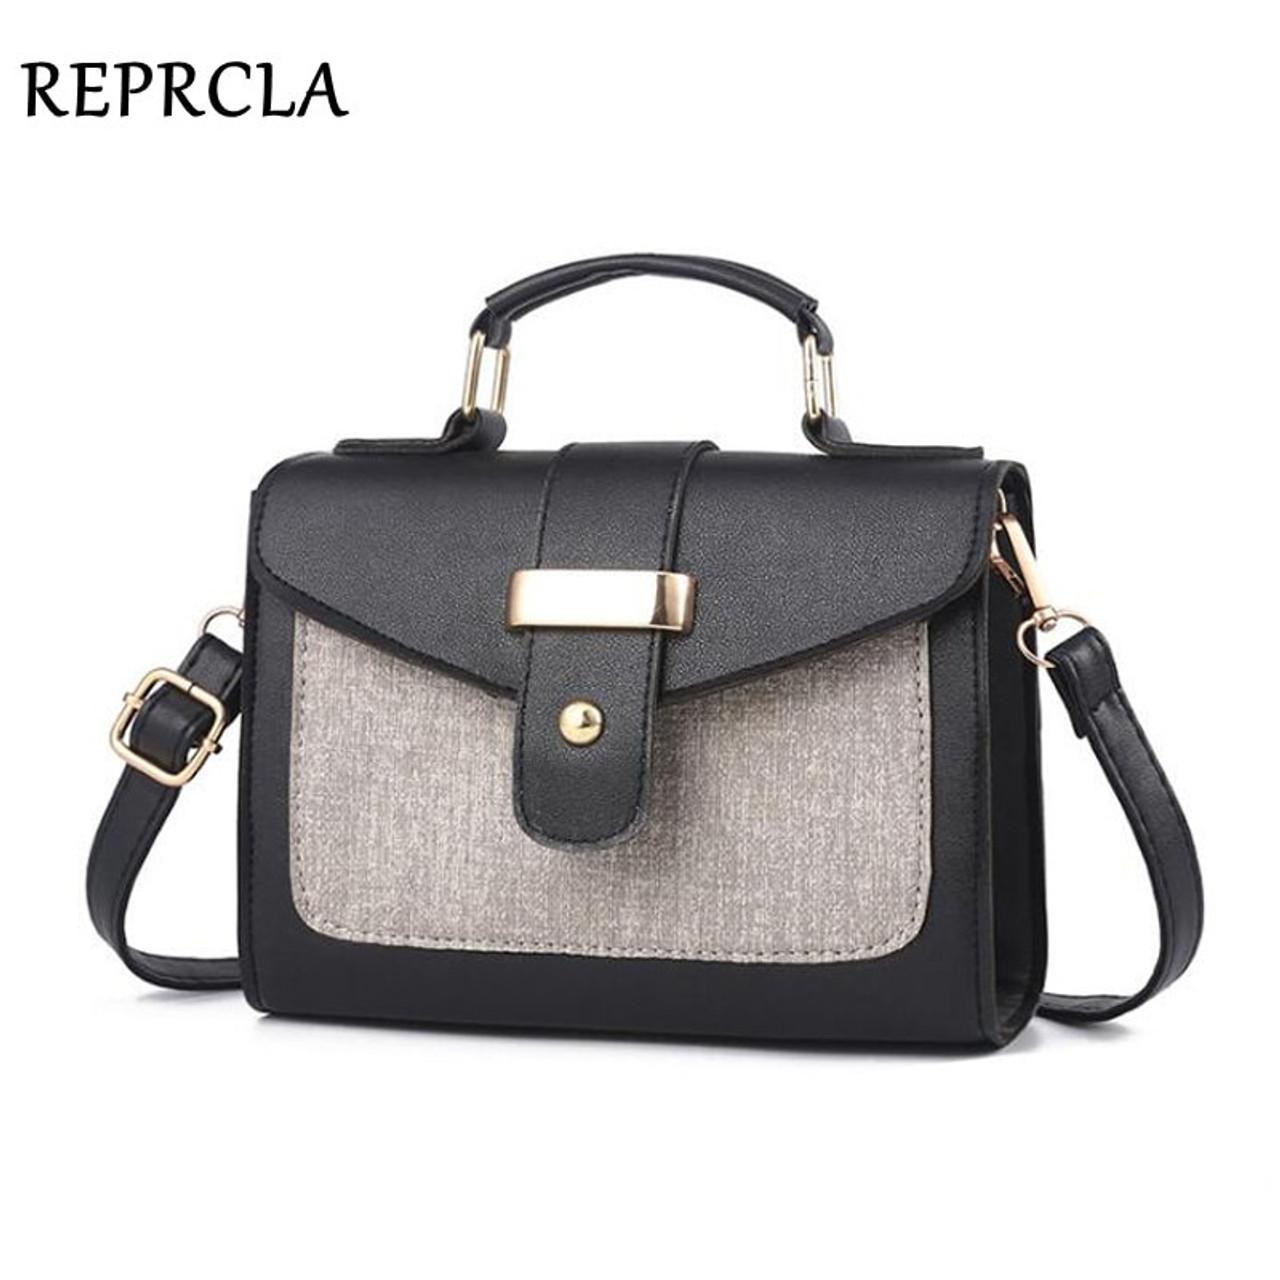 4ddb68648493a REPRCLA 2018 Fashion Shoulder Bag Leather Handbag Small Flap Women  Messenger Bags High Quality PU Crossbody ...